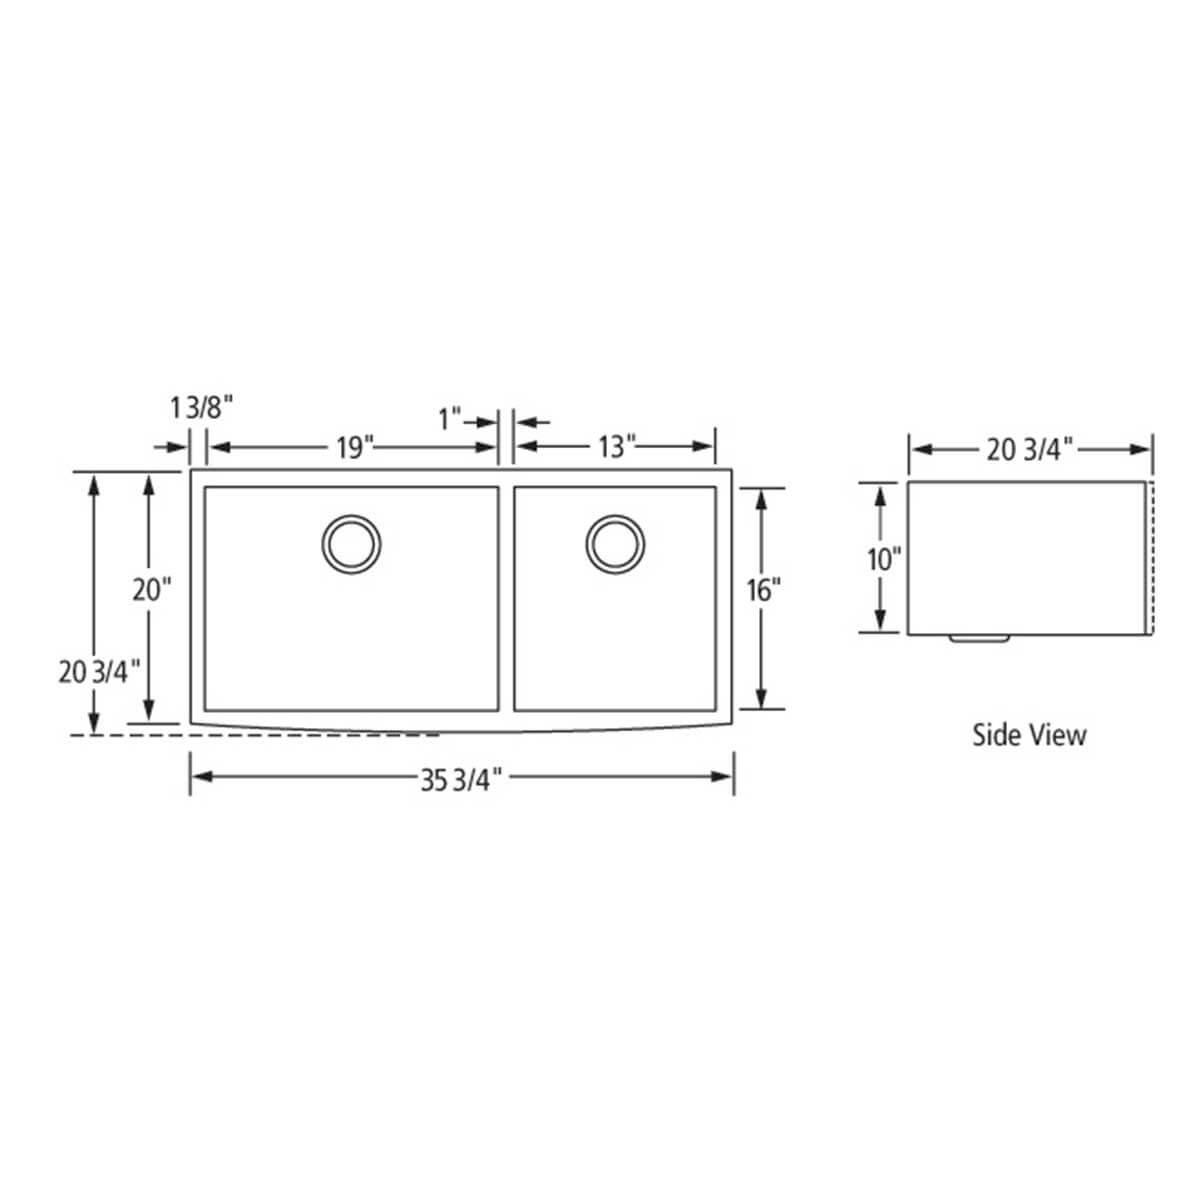 CPAZ3621-D1010 Artisan draw